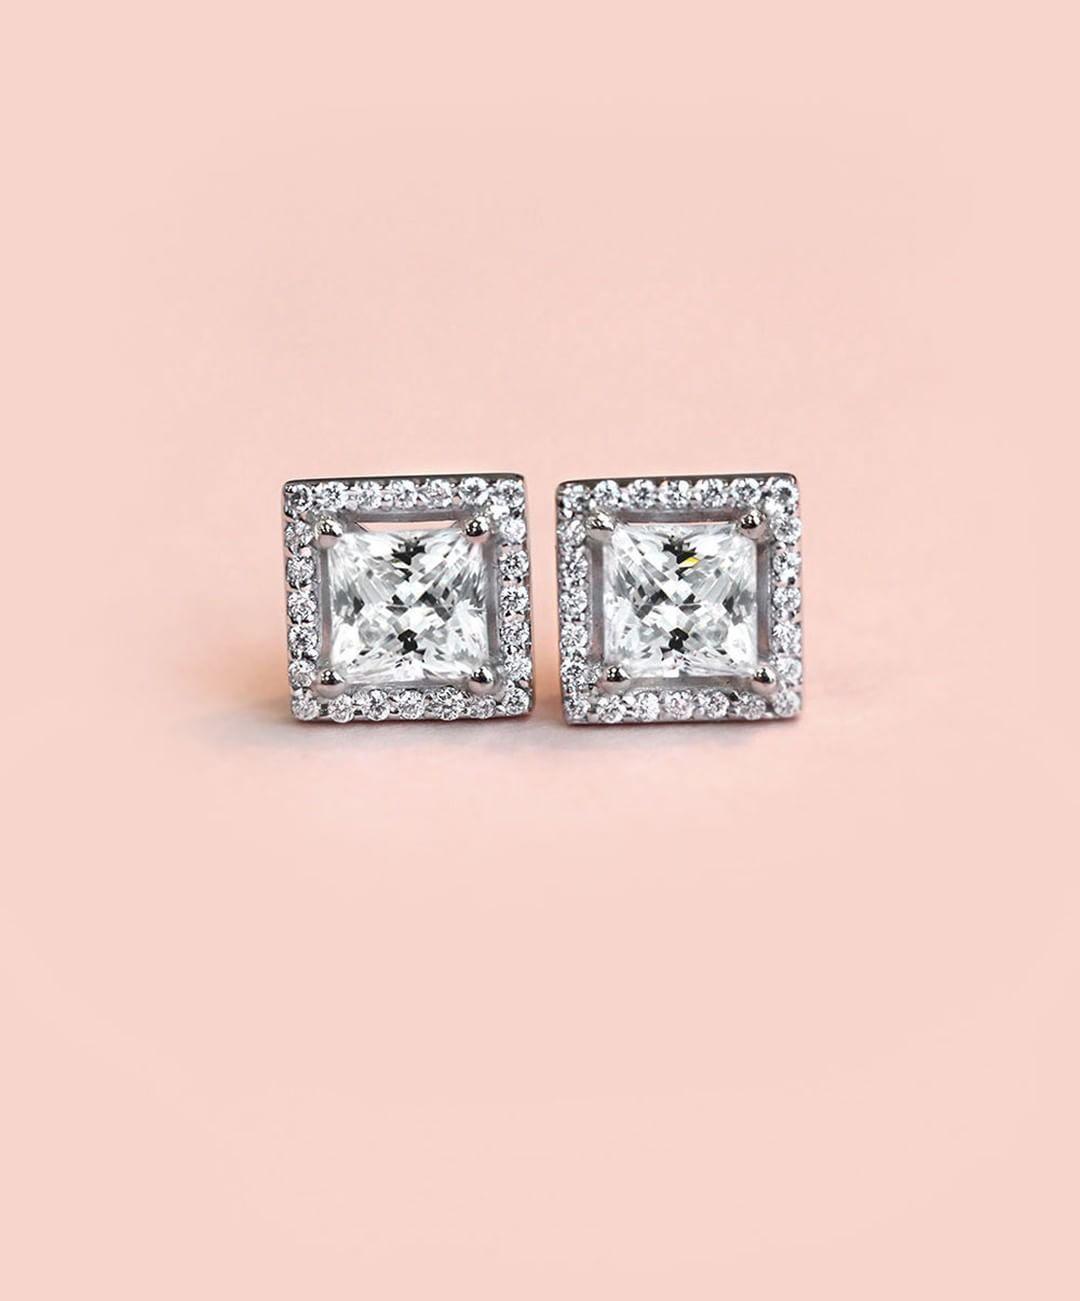 Diamond Halo Stud Earrings | Diamond, Jewelry collection and Quality ...